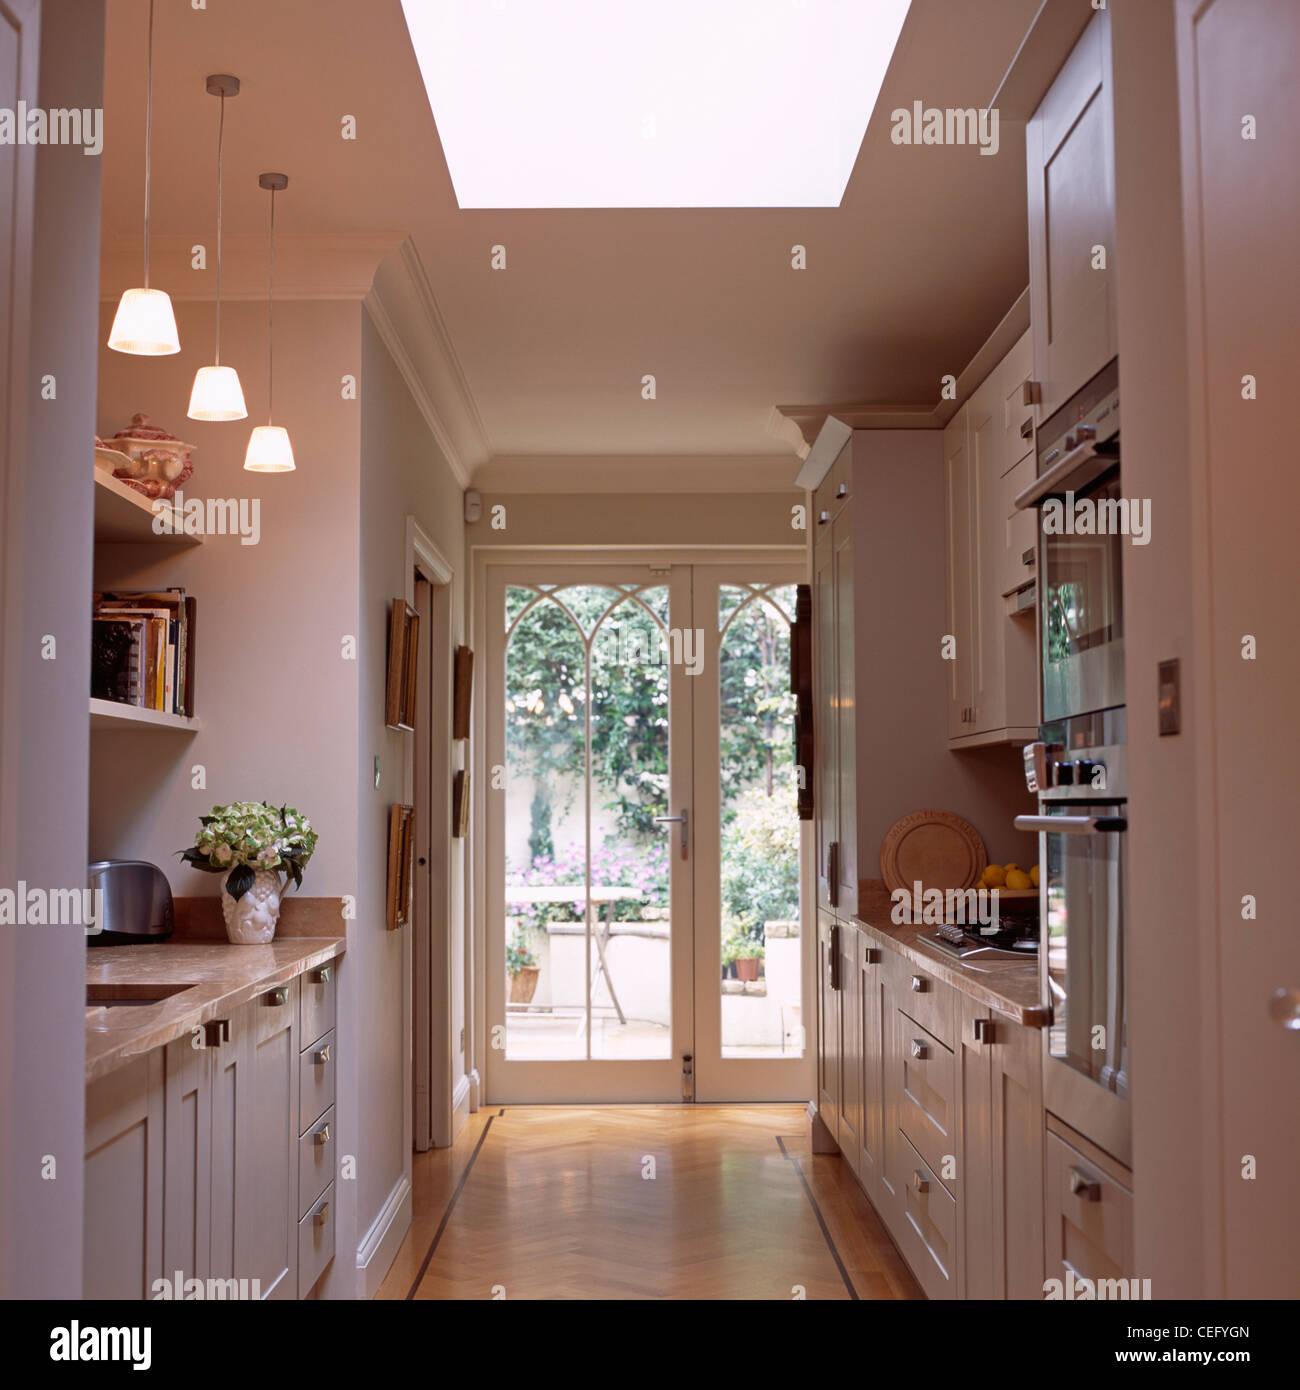 Pendant Lights Above Worktop In White Galley Kitchen